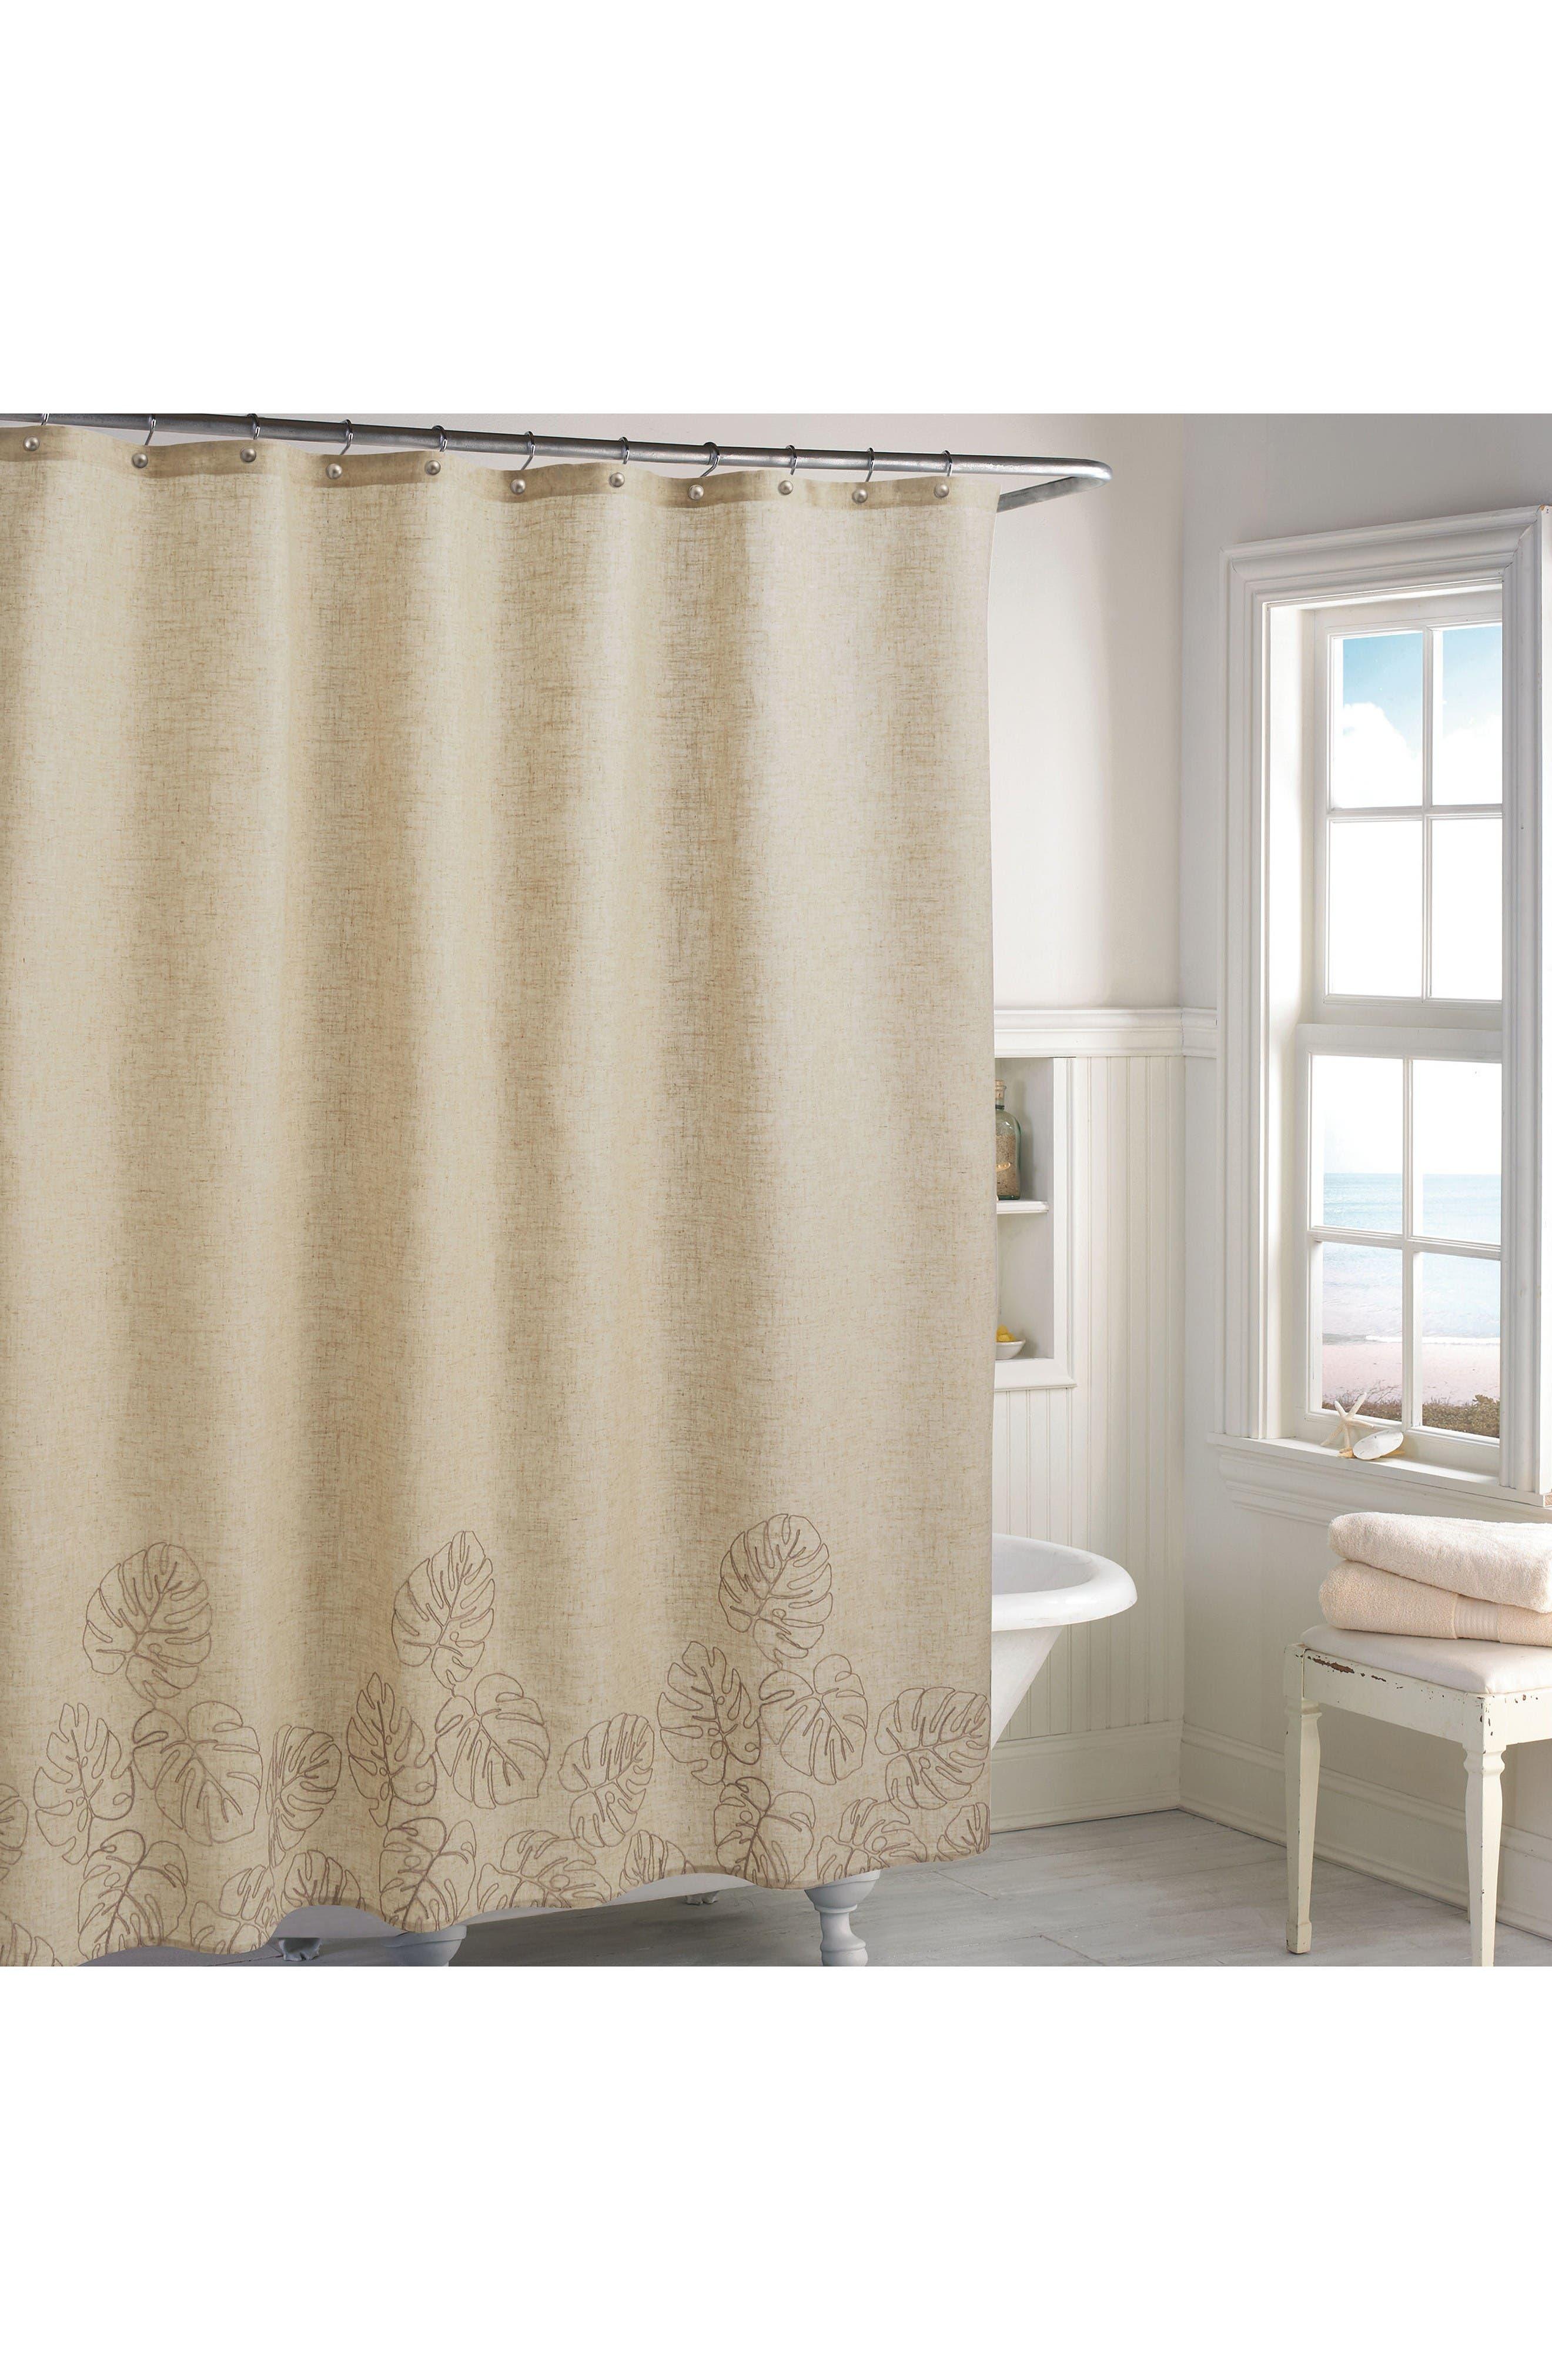 Alternate Image 1 Selected - Destinations Panama Shower Curtain